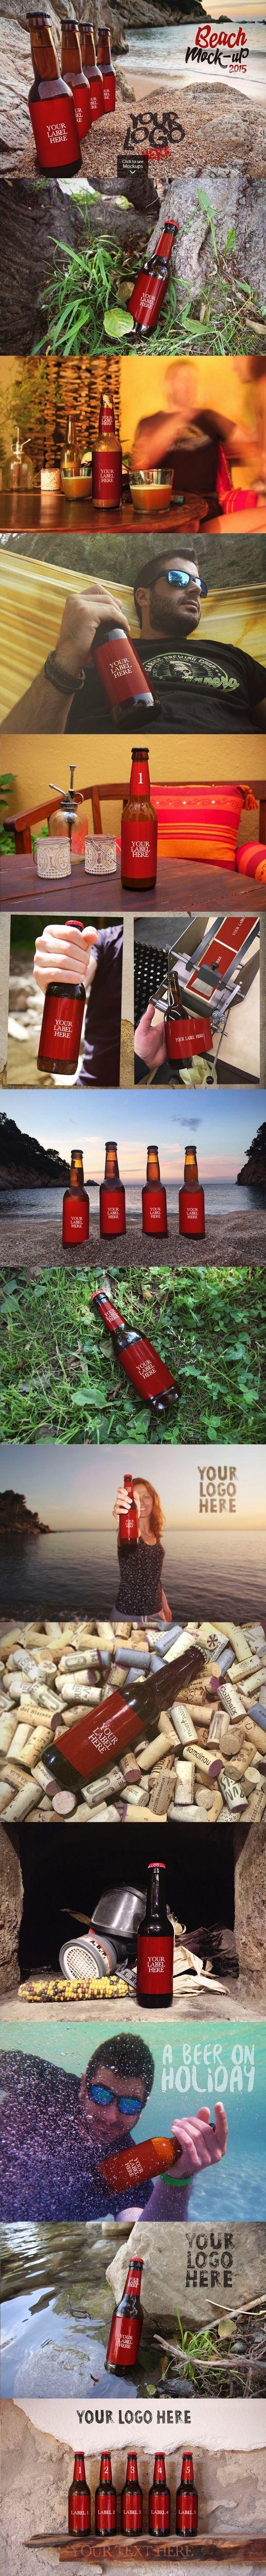 Download Amber Pet Beer Bottle Mockup Yellowimages